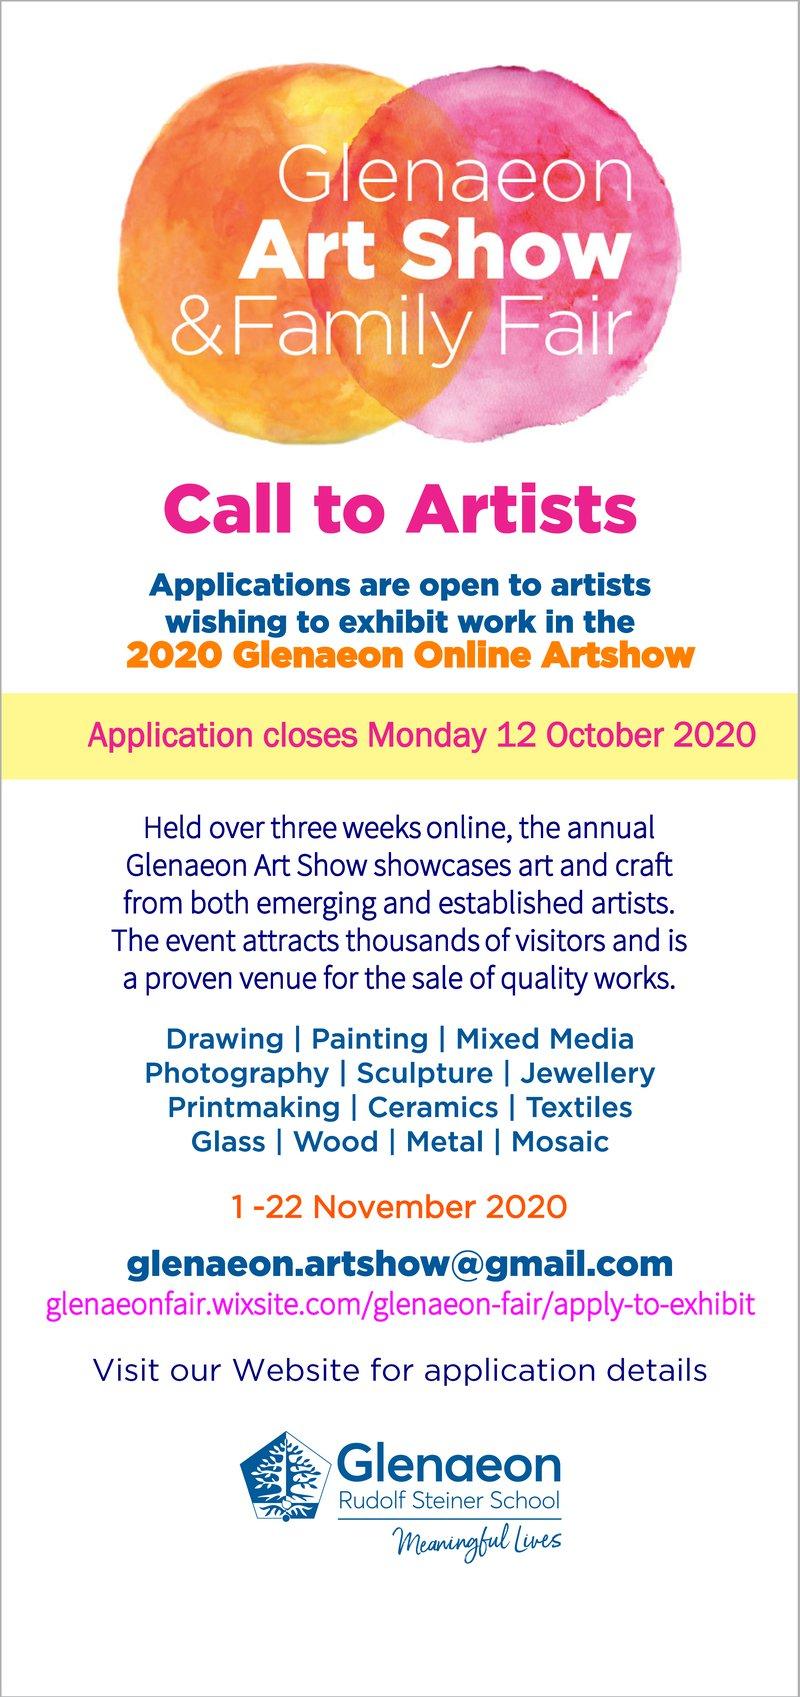 Glenaeon Art Show goes digital